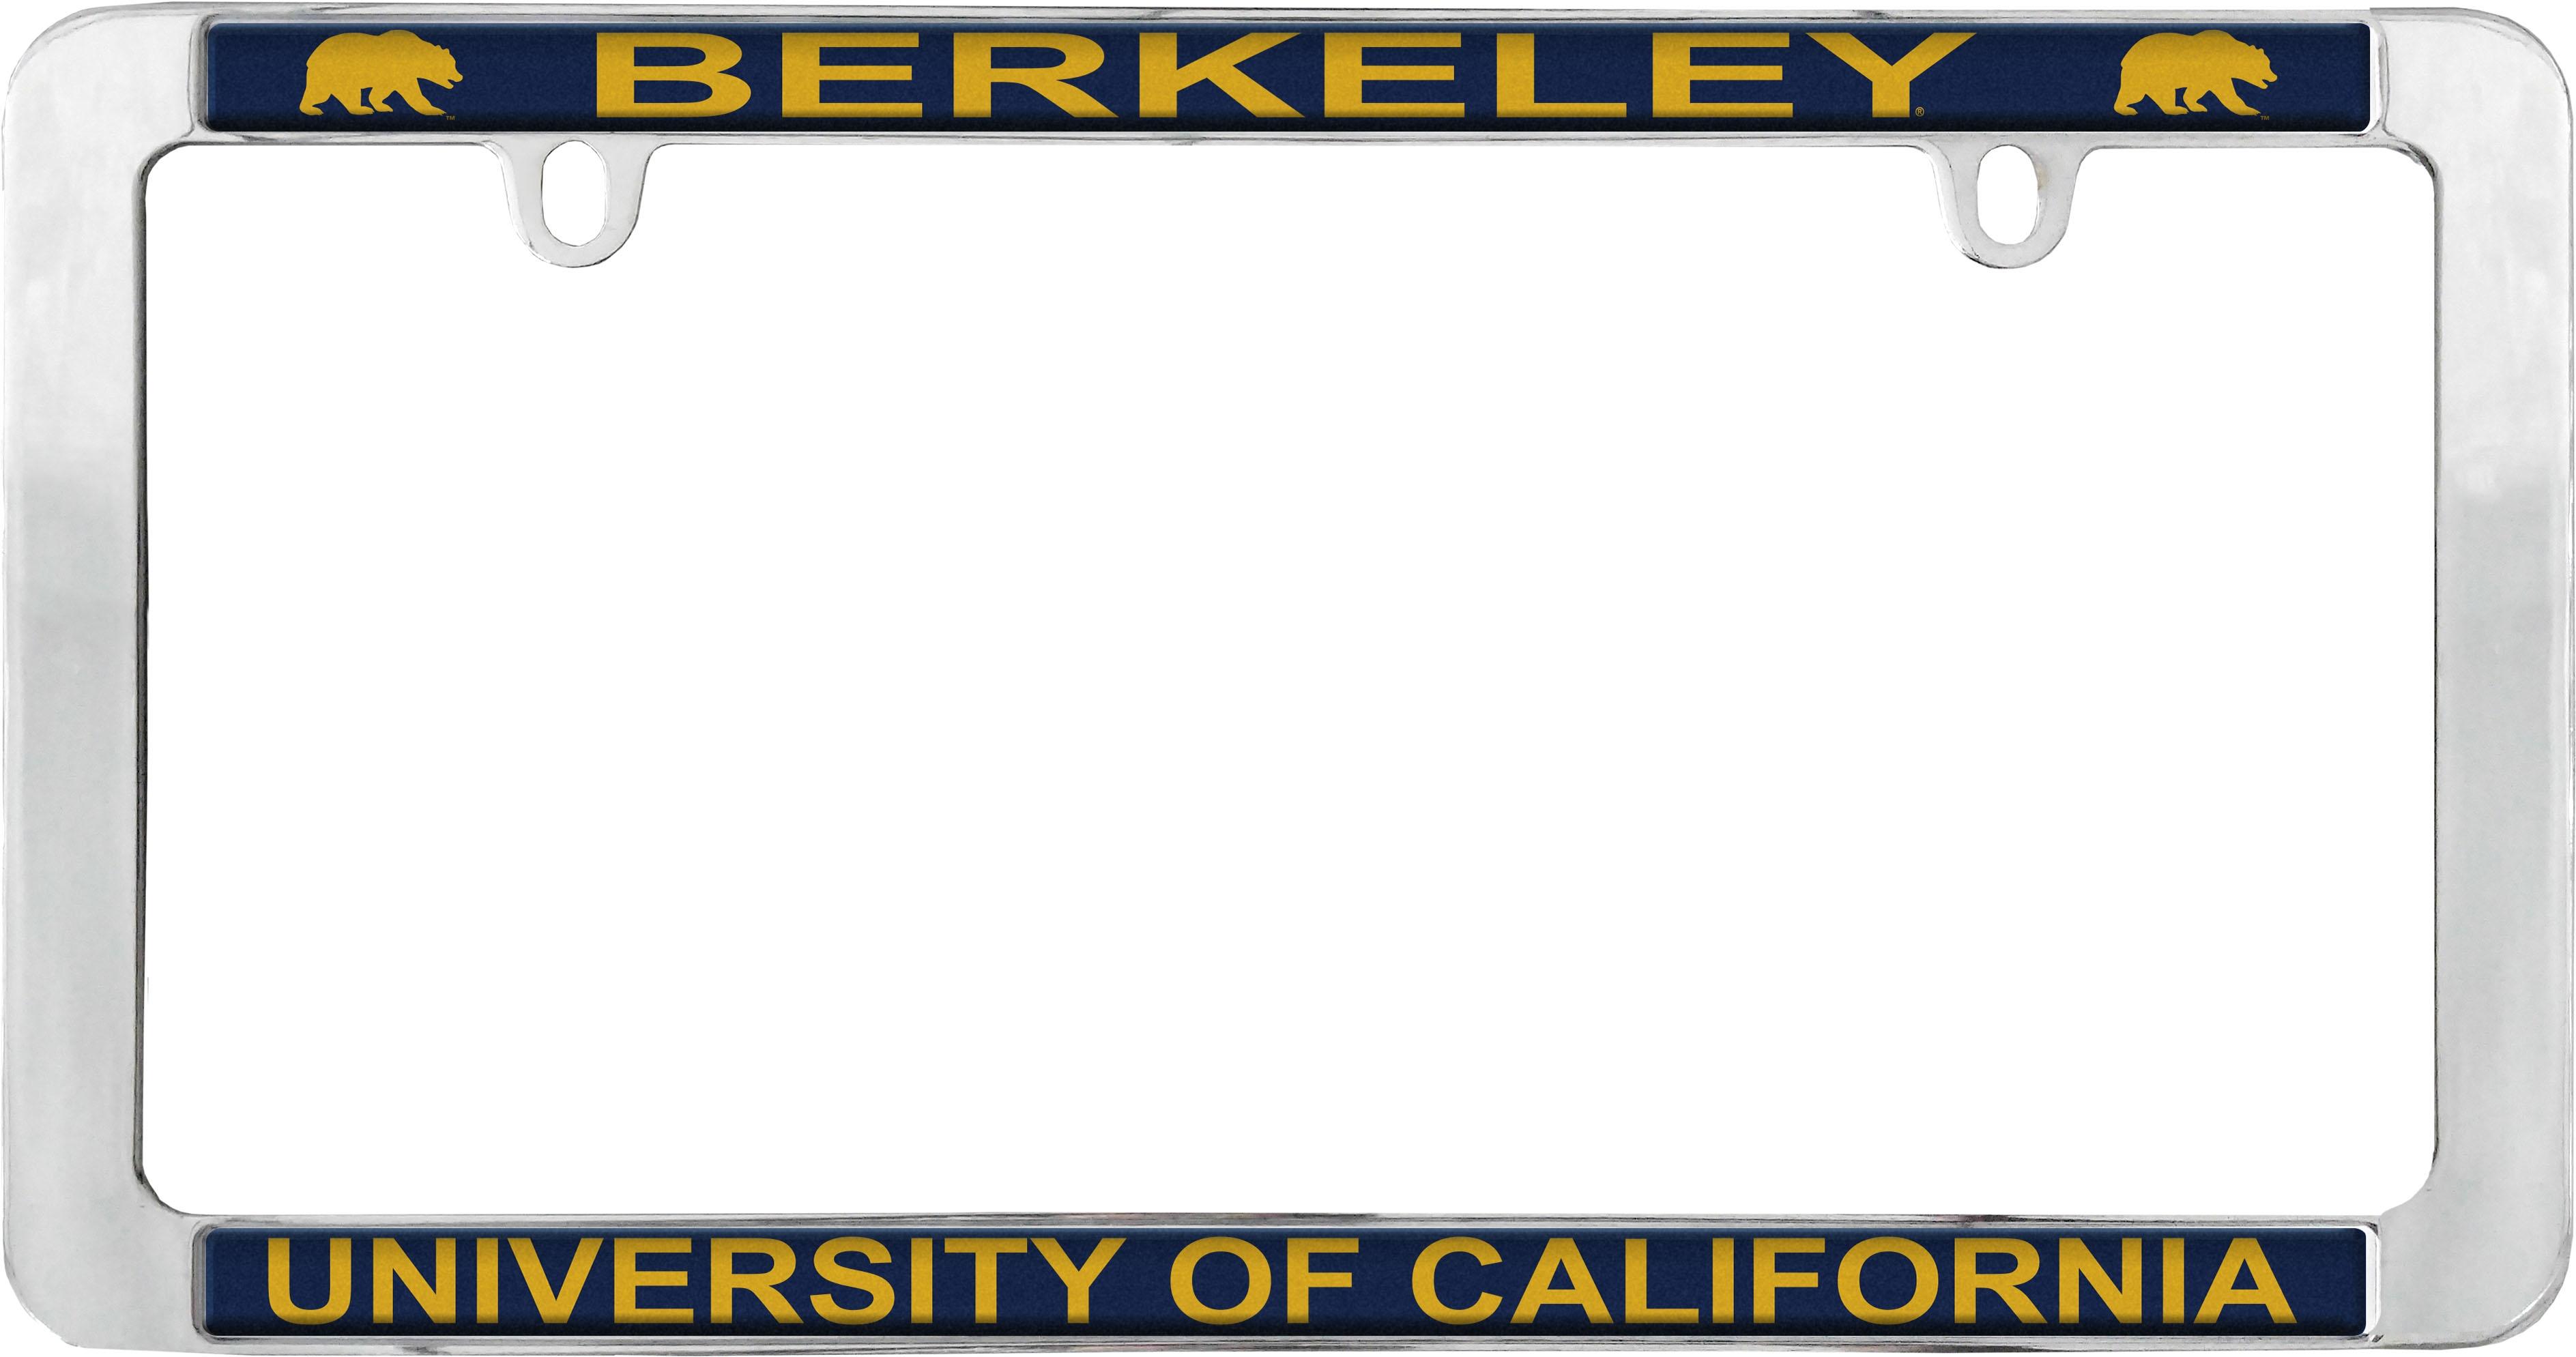 University of California Berkeley License Plate Frame School Name